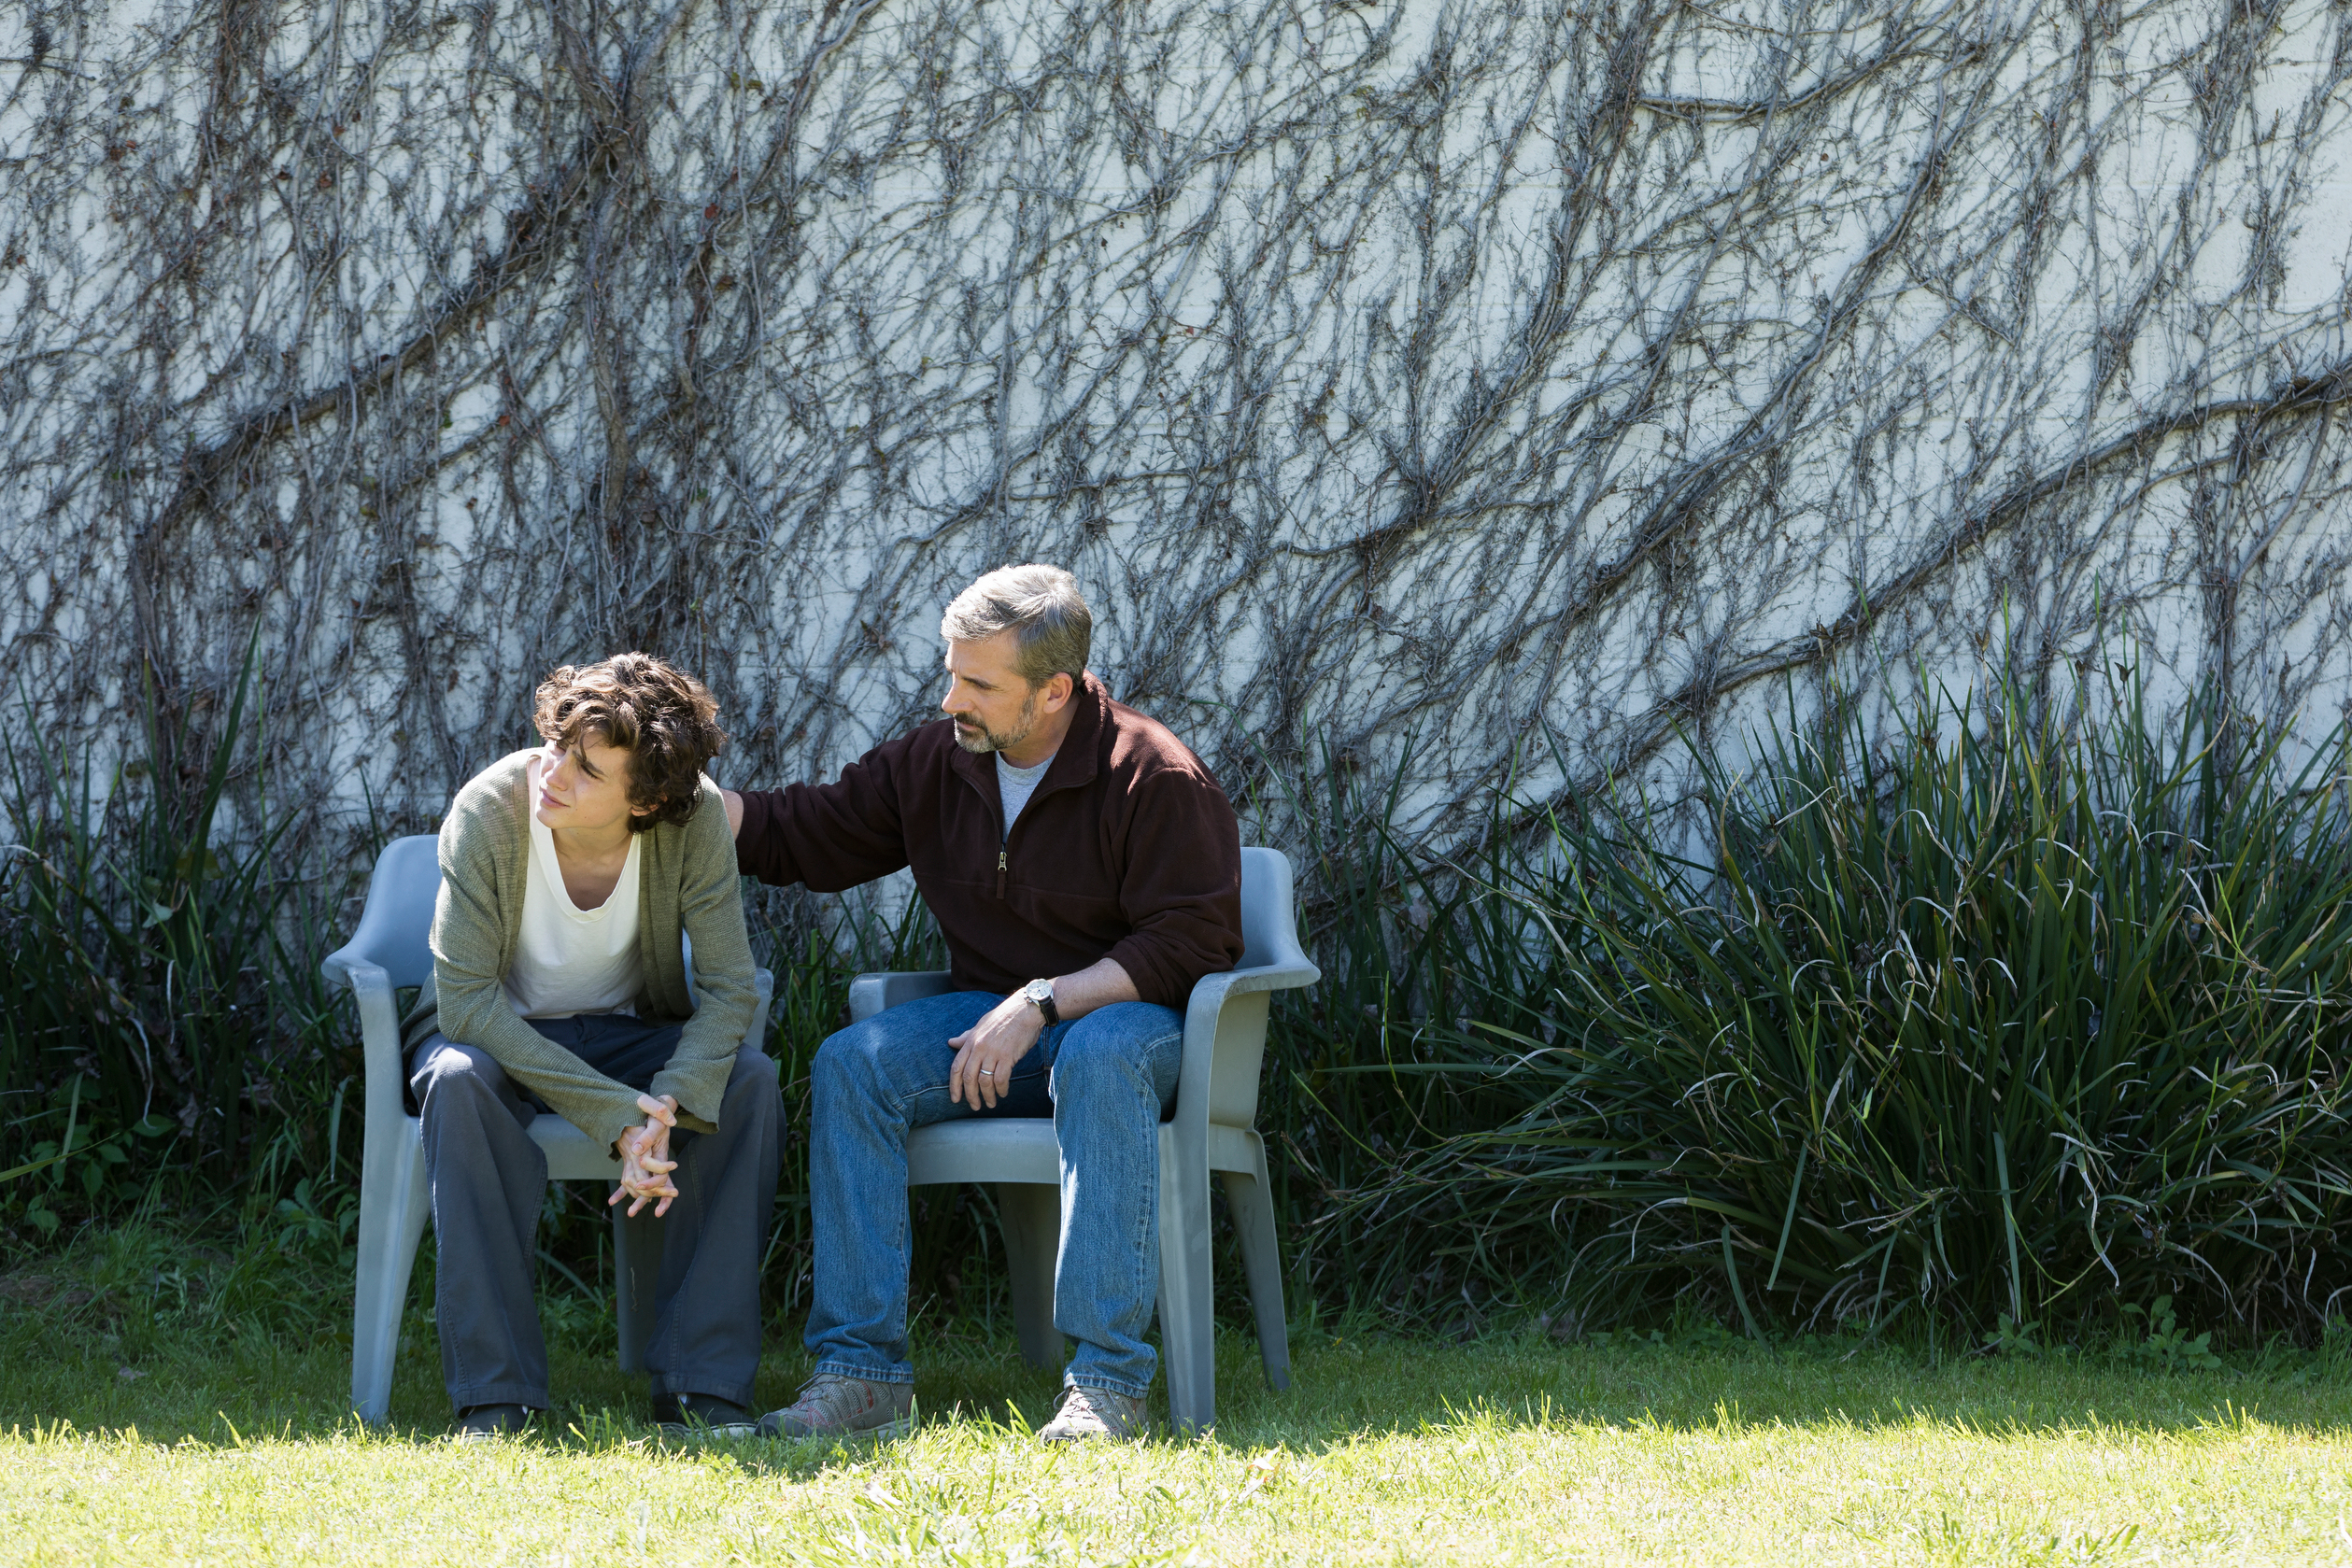 'Beautiful Boy': Carell, Chalamet Star in Gut-Wrenching Addiction Drama